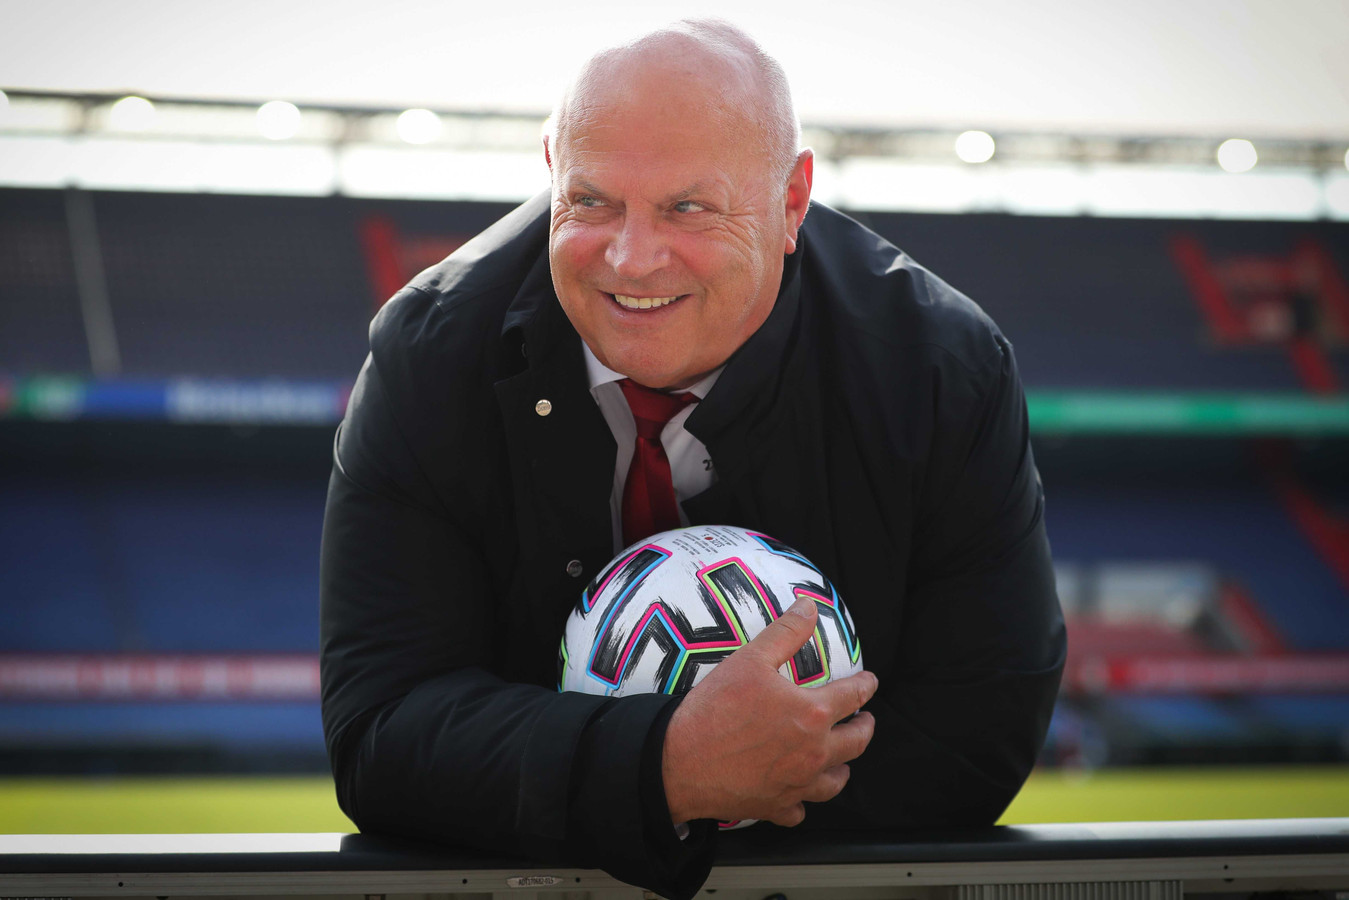 Feyenoord teammanager en voormalig Sparta doelman Bas van Noortwijk